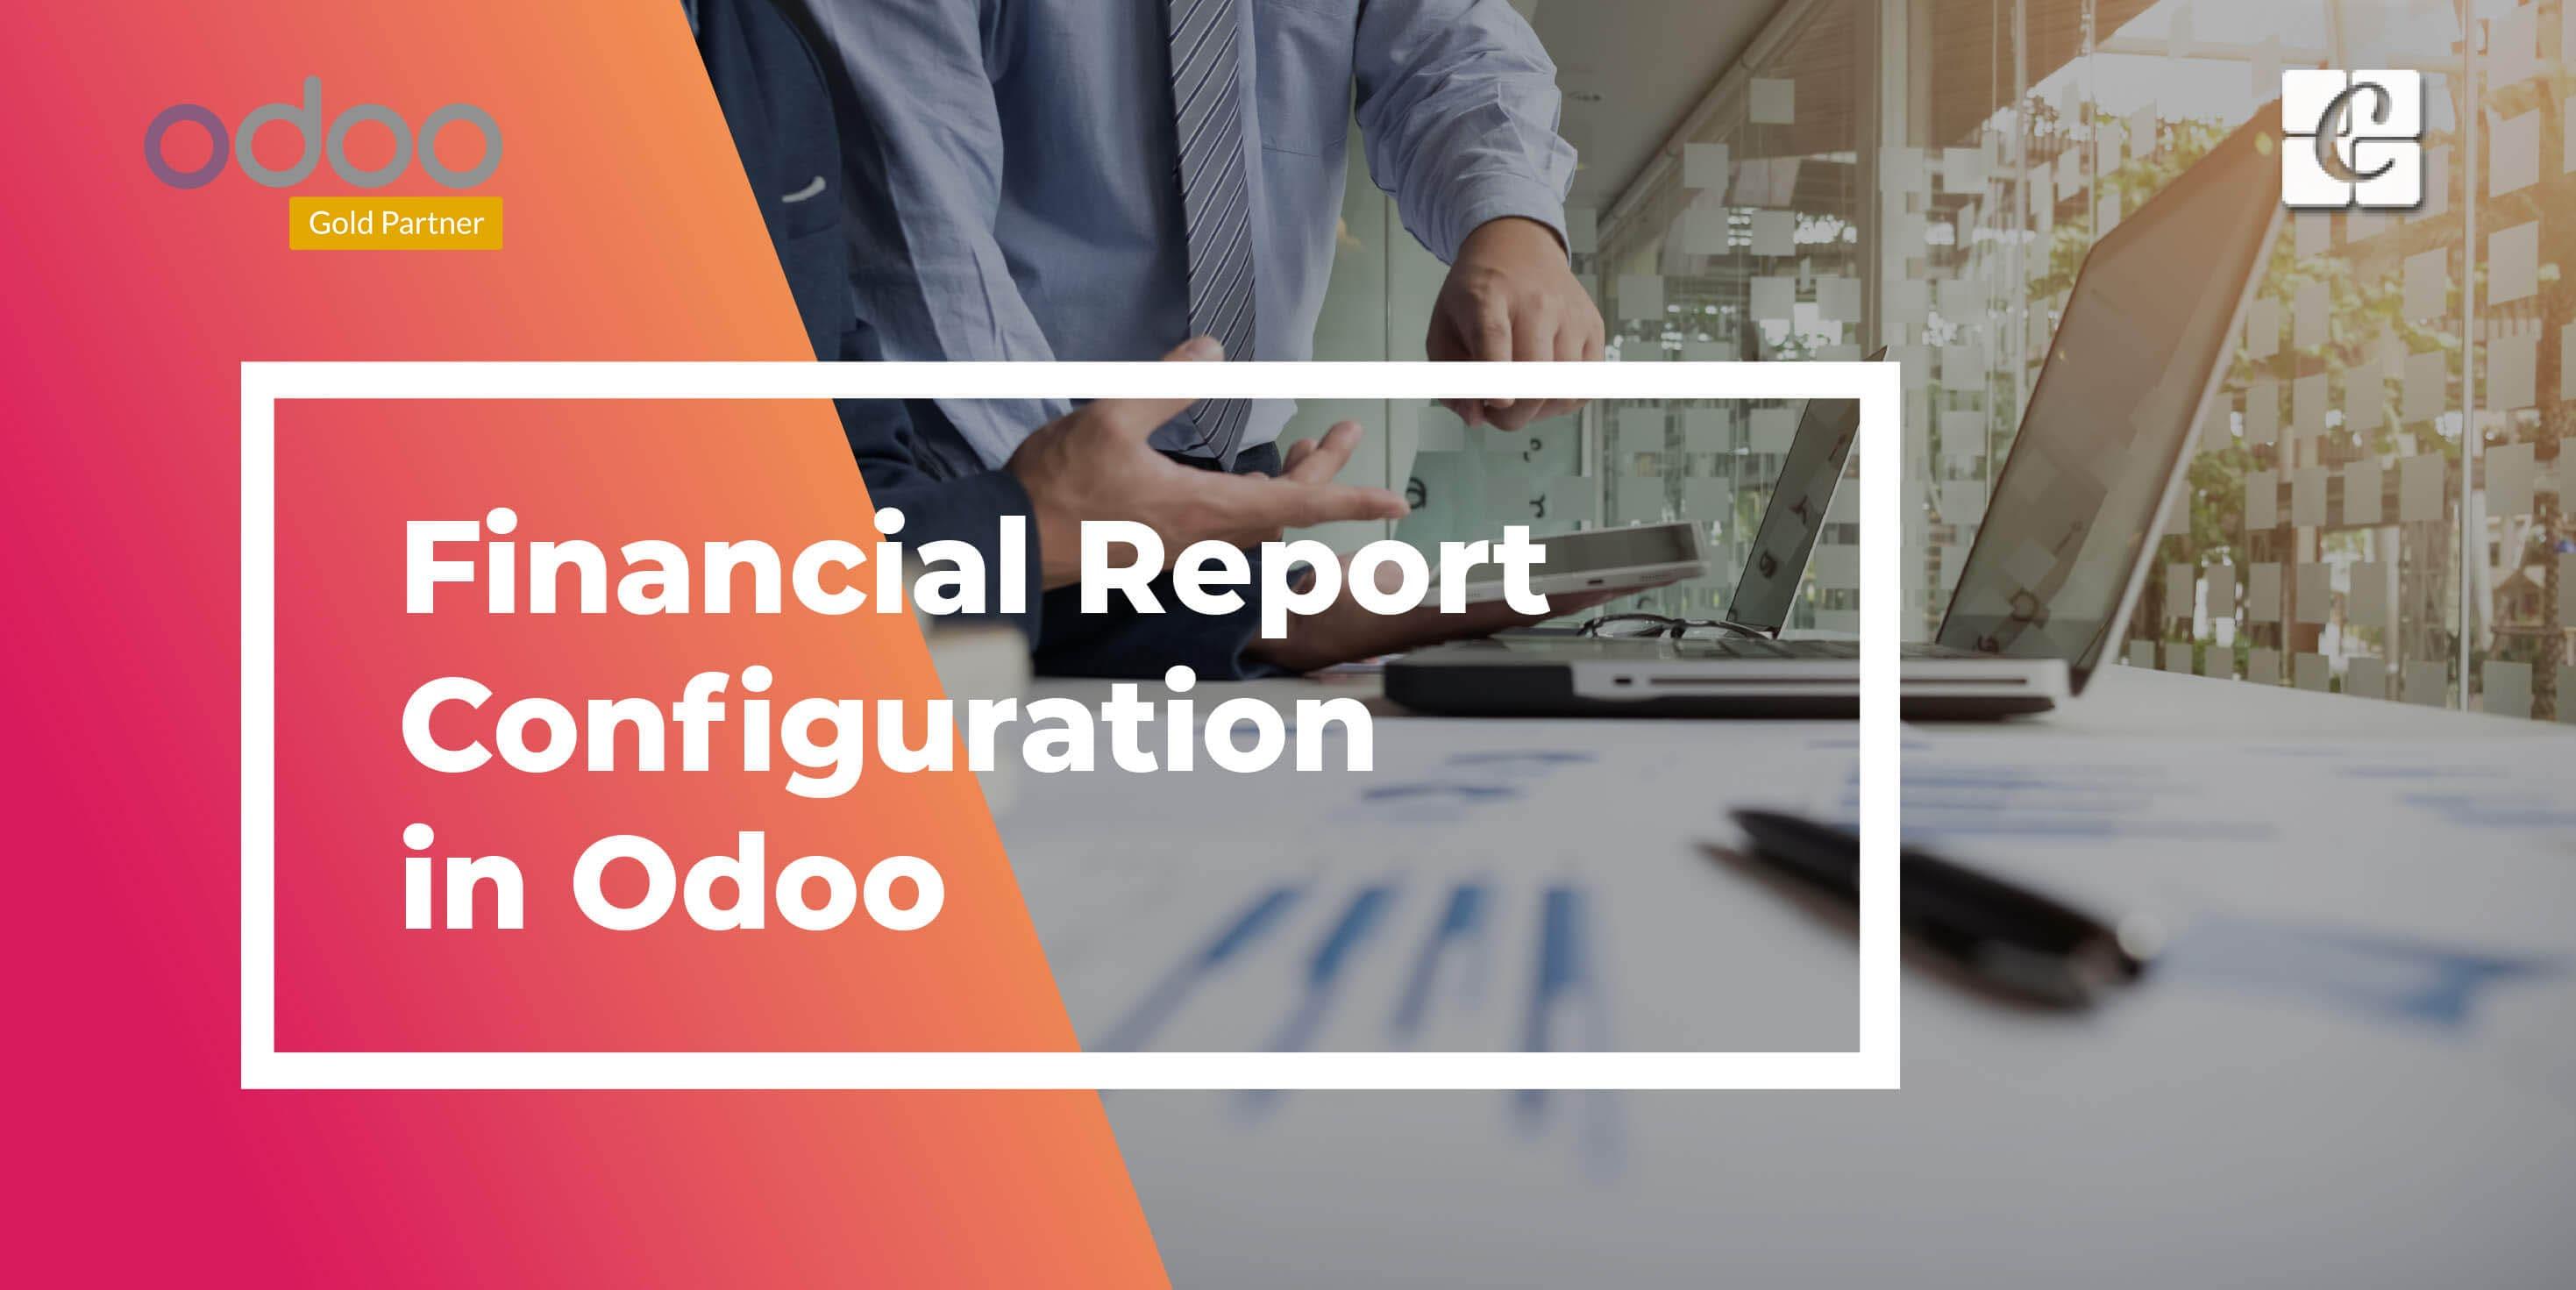 financial-report-configuration-in-odoo.jpg